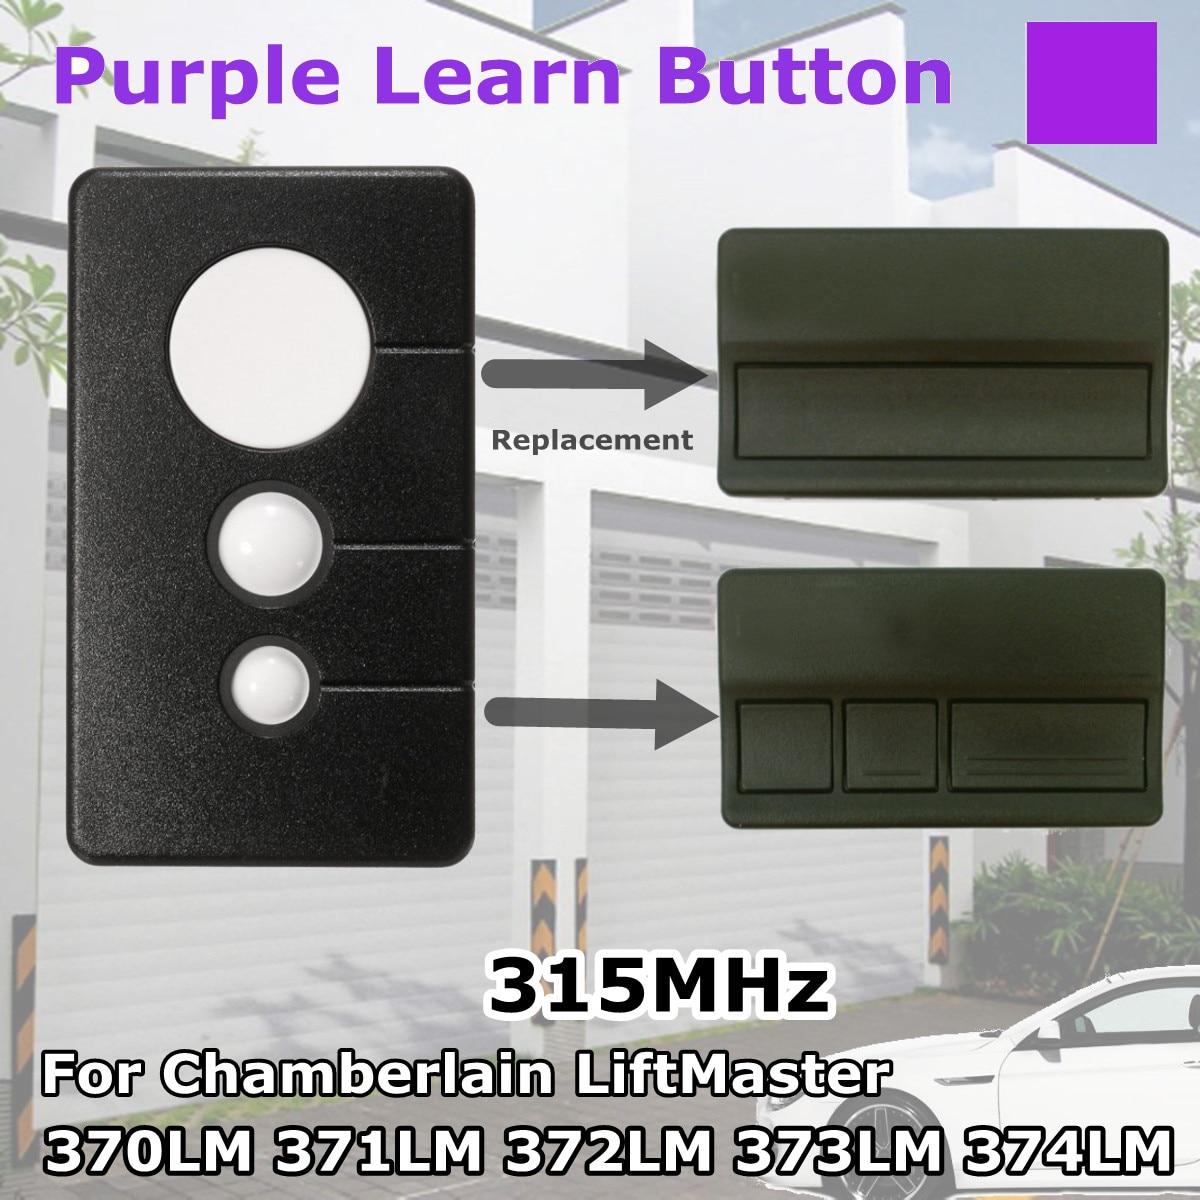 Black + Blue 2 Garage Door Remote Opener for Liftmaster 373LM Chamberlain 953CD